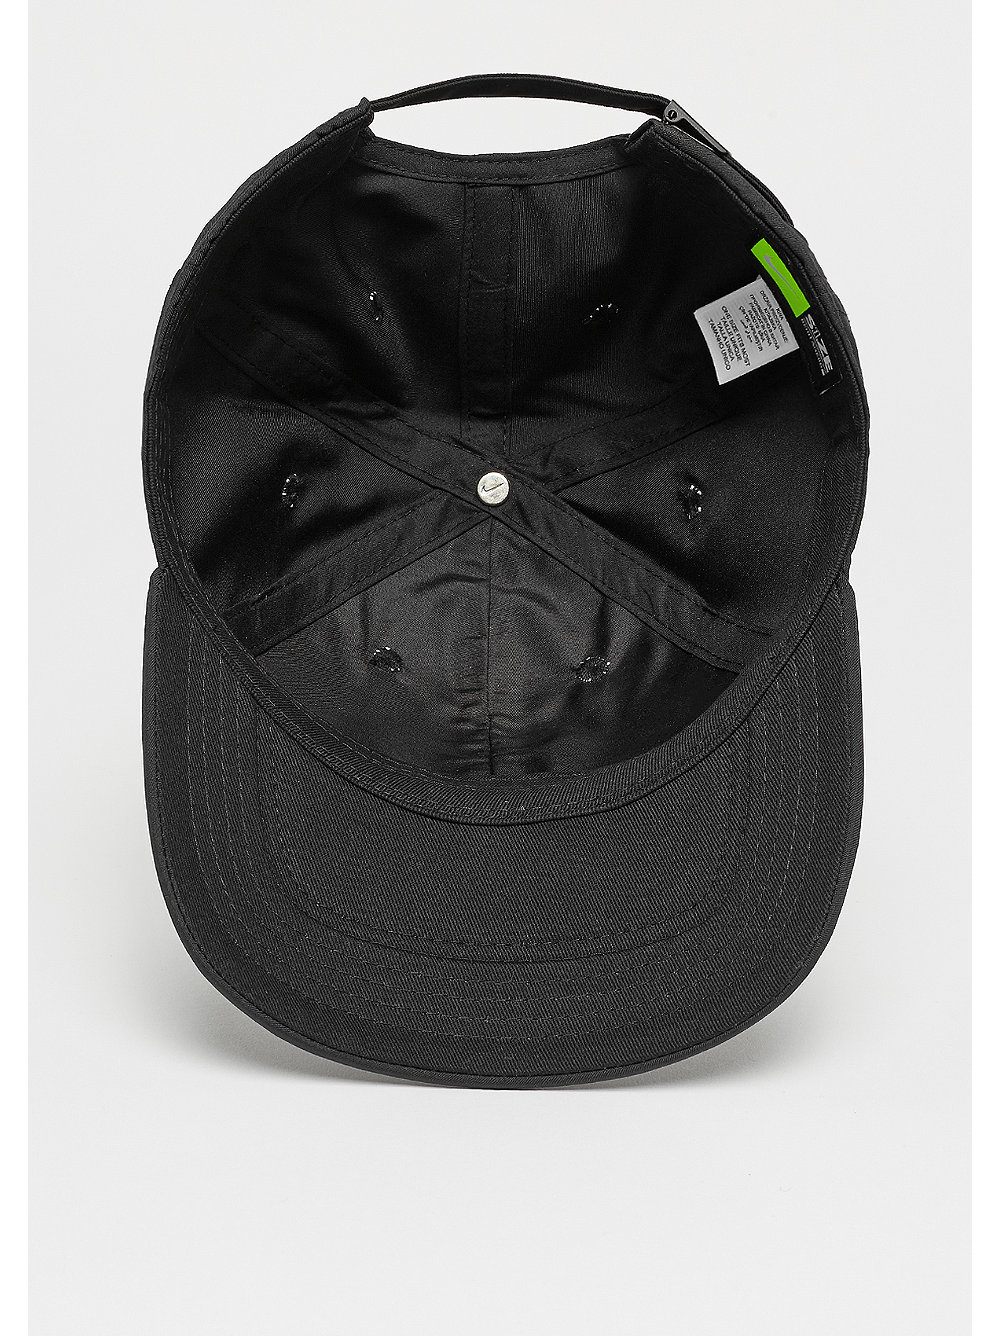 40e4ee3e96181 Compra NIKE Heritage 86 Metal Futur black black black black Gorras de  Baseball en SNIPES